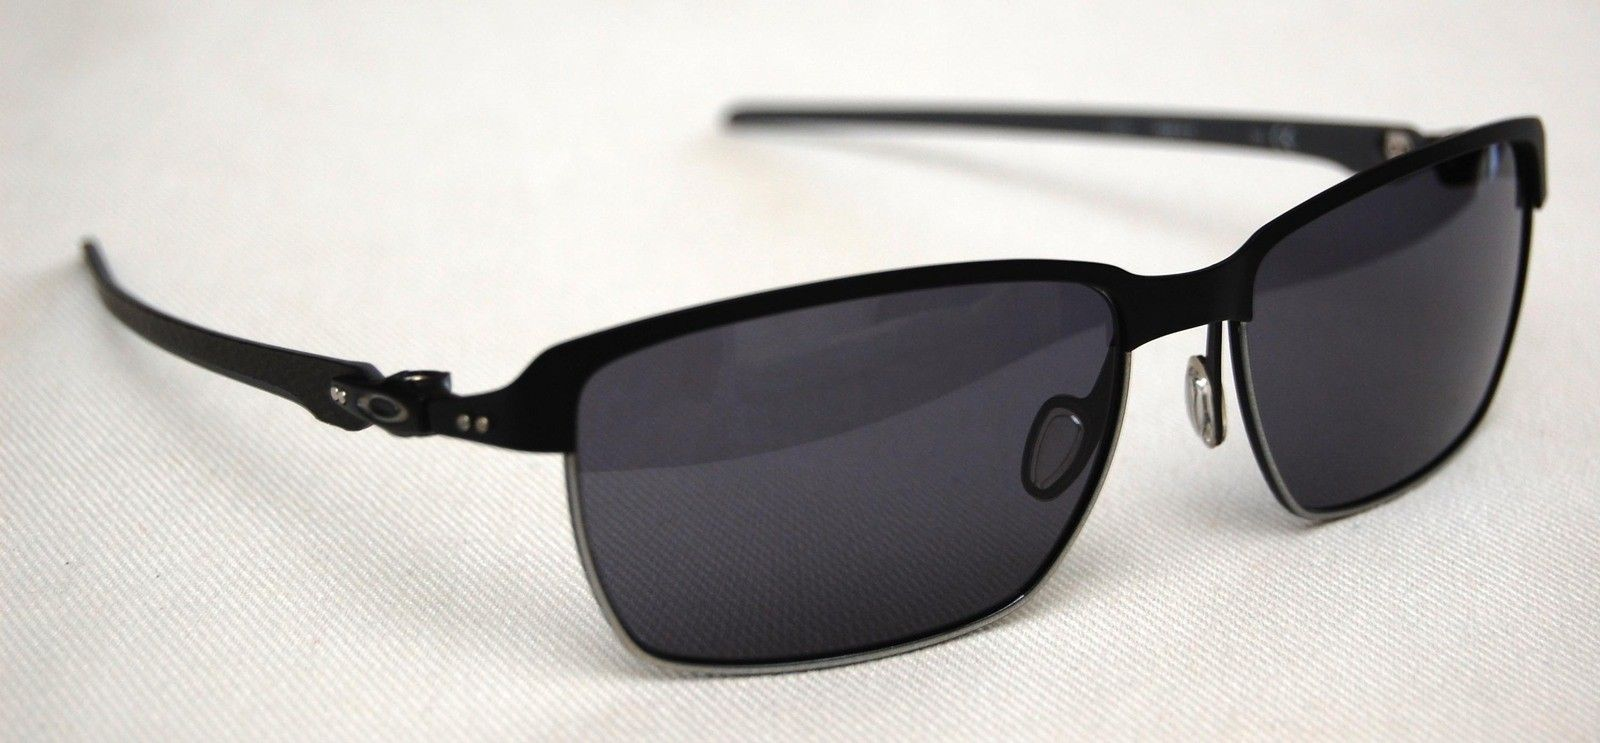 Tinfoil Carbon OO6018-01 Matte Black / Silver   Grey Lens - 04.jpg